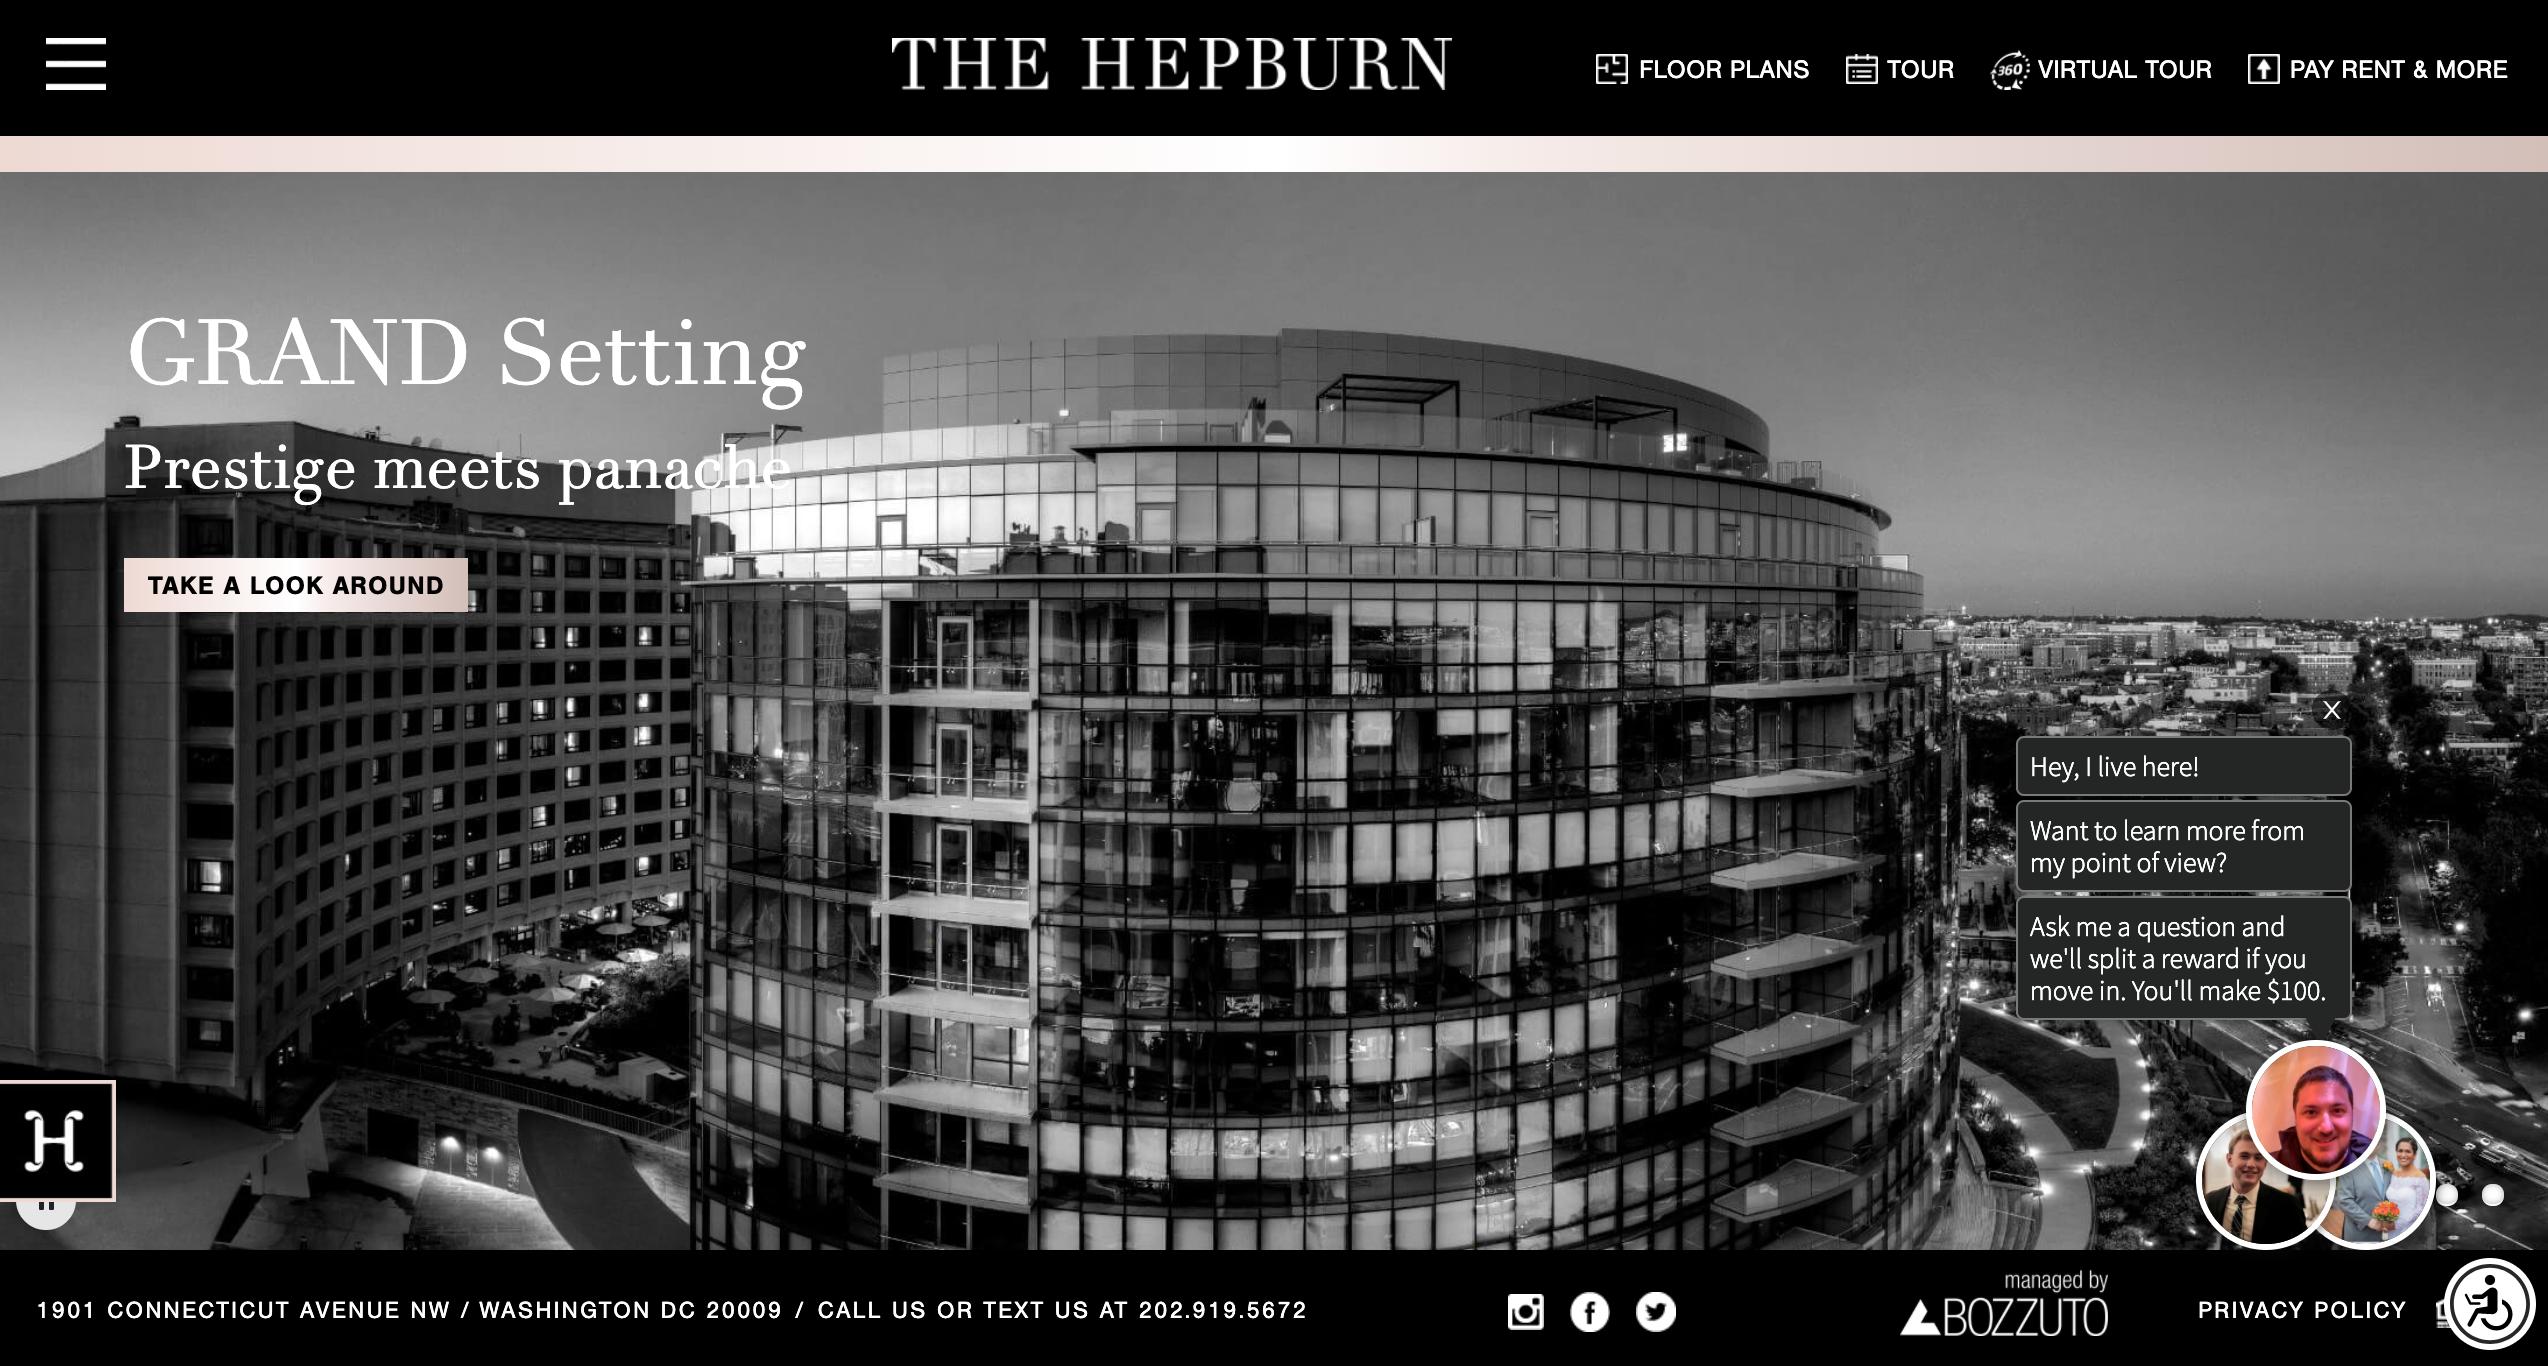 The Hepburn Virtual Tour